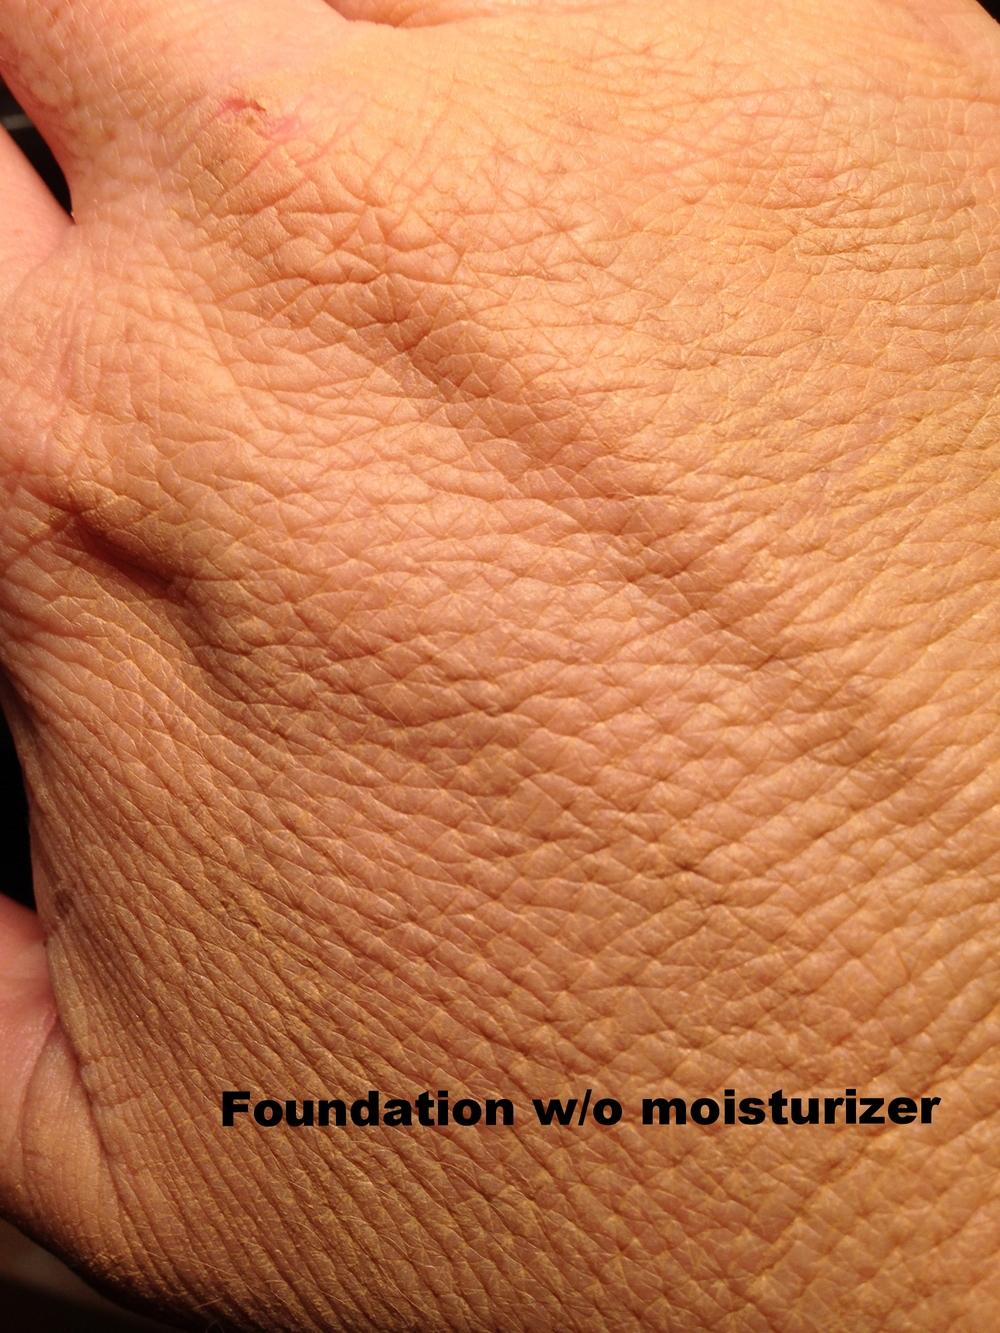 foundation without moisturizer